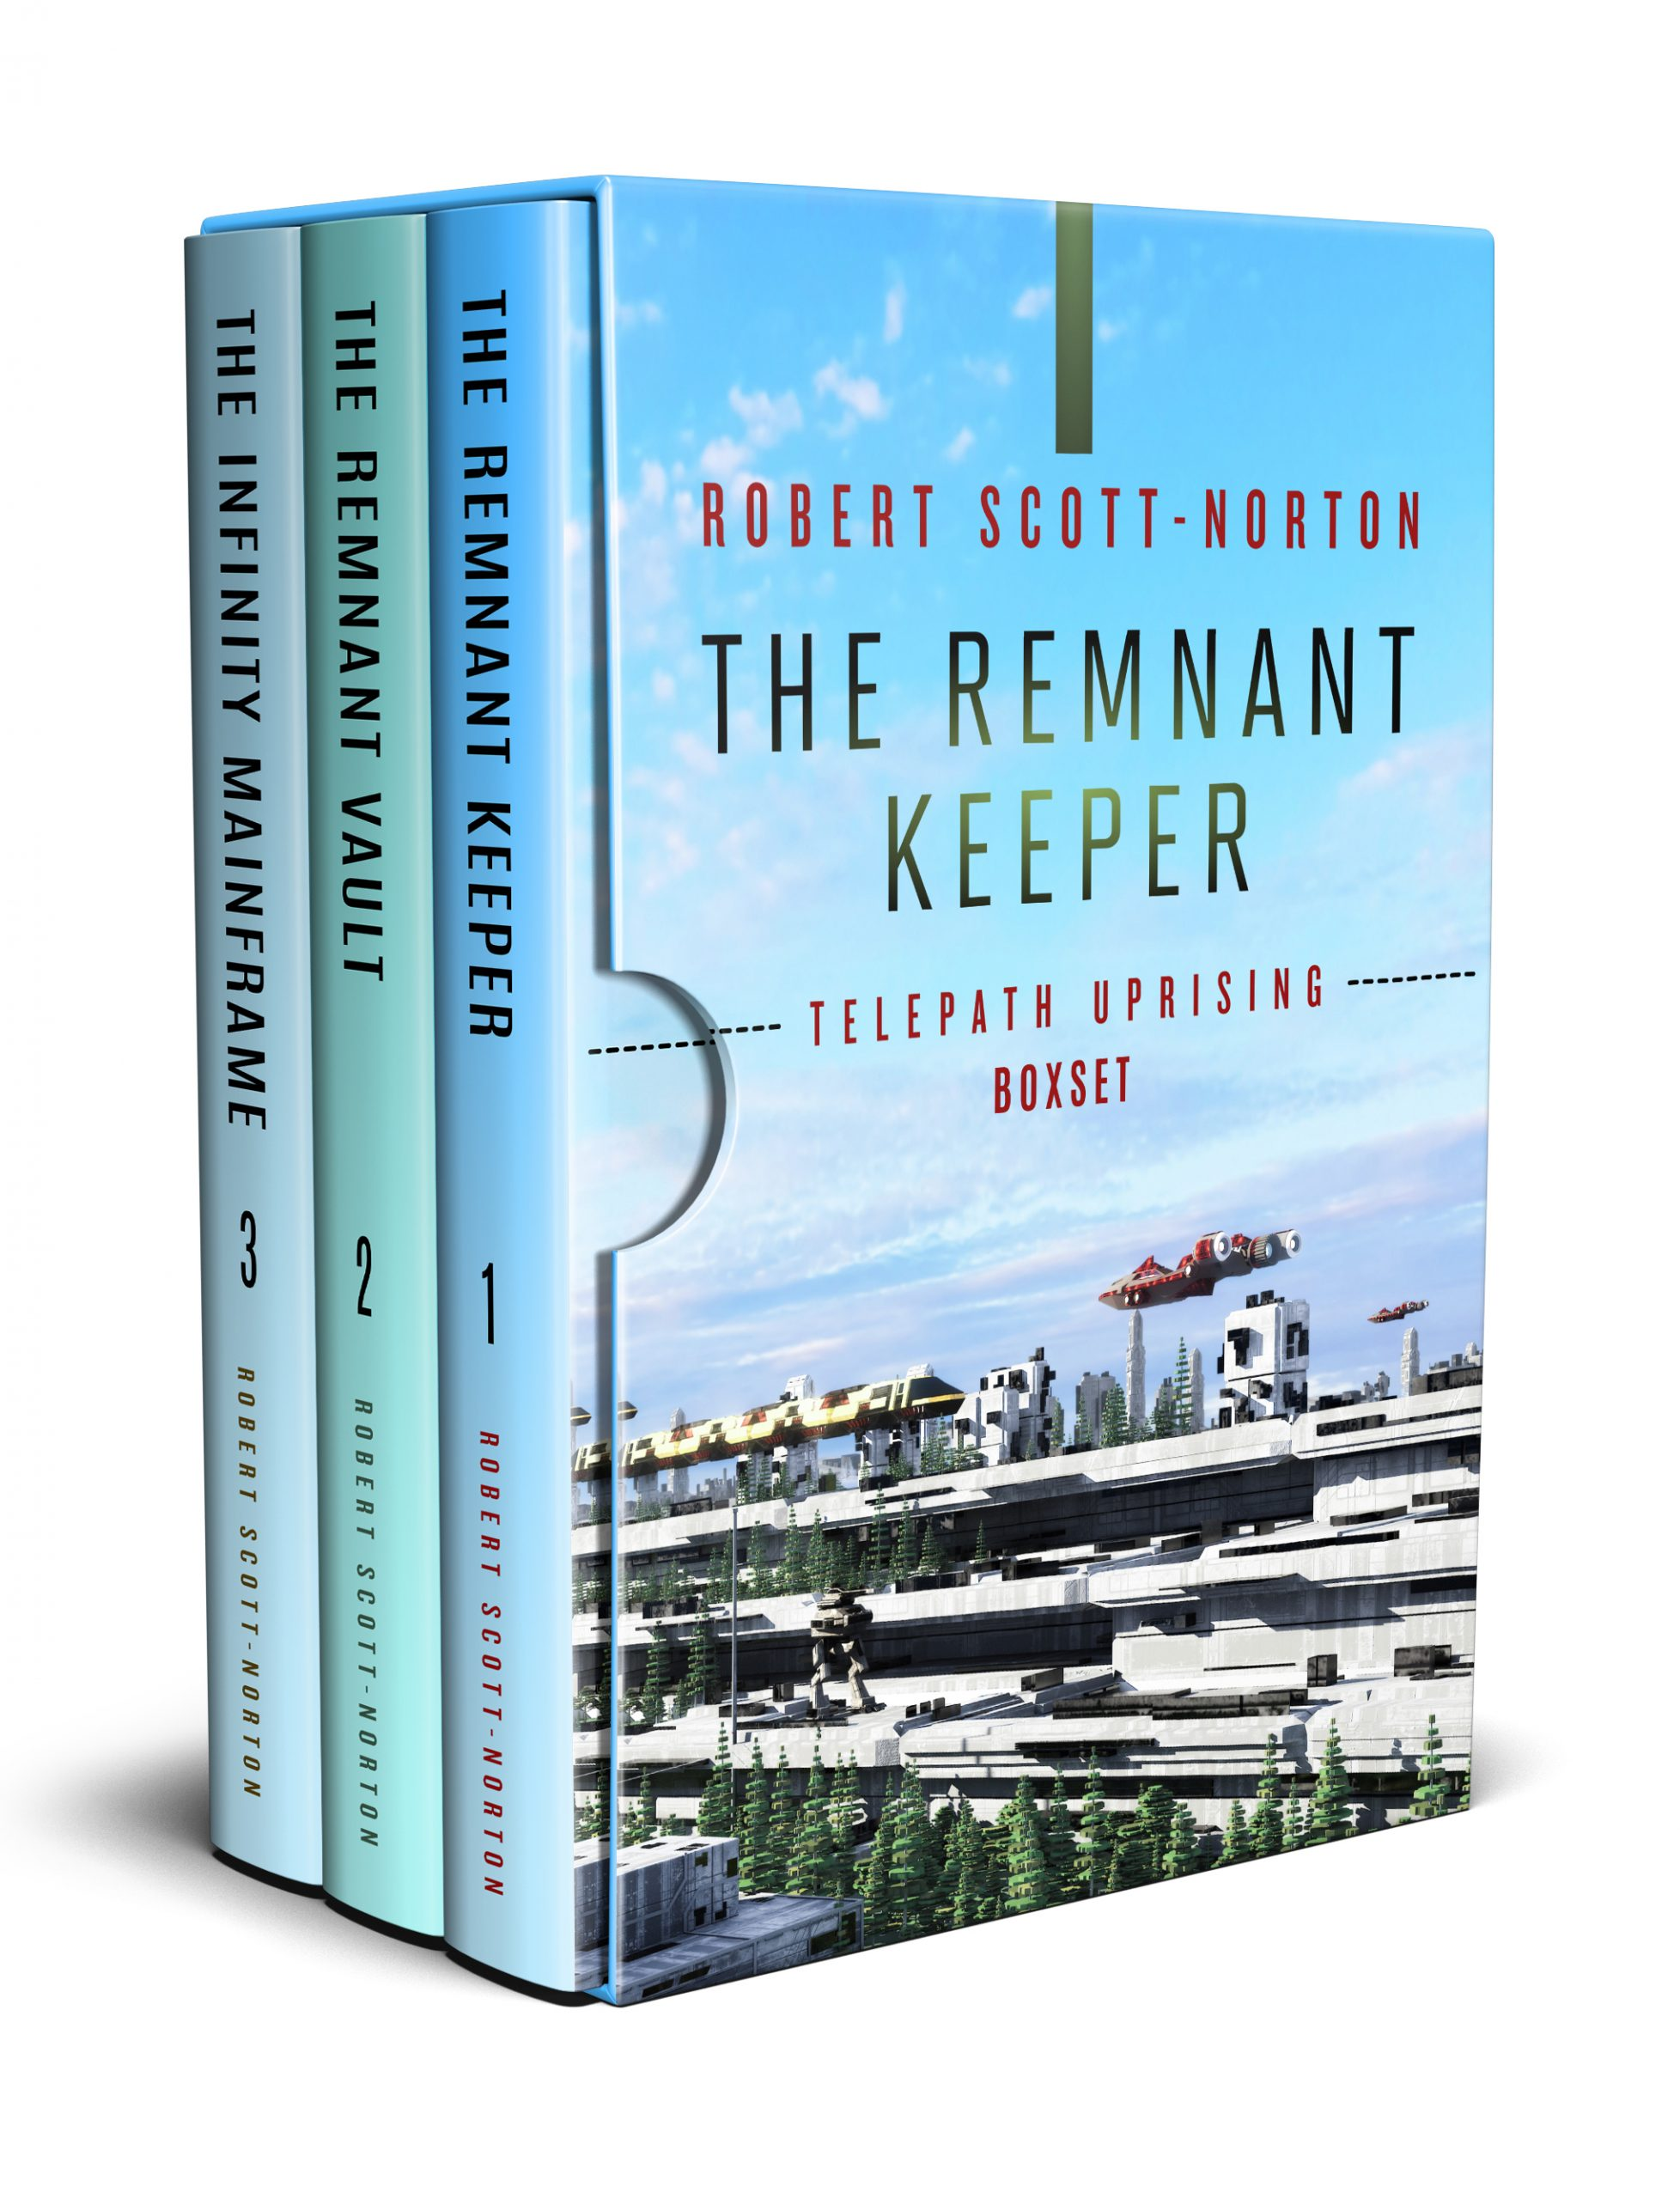 Boxset of three telepath uprising books